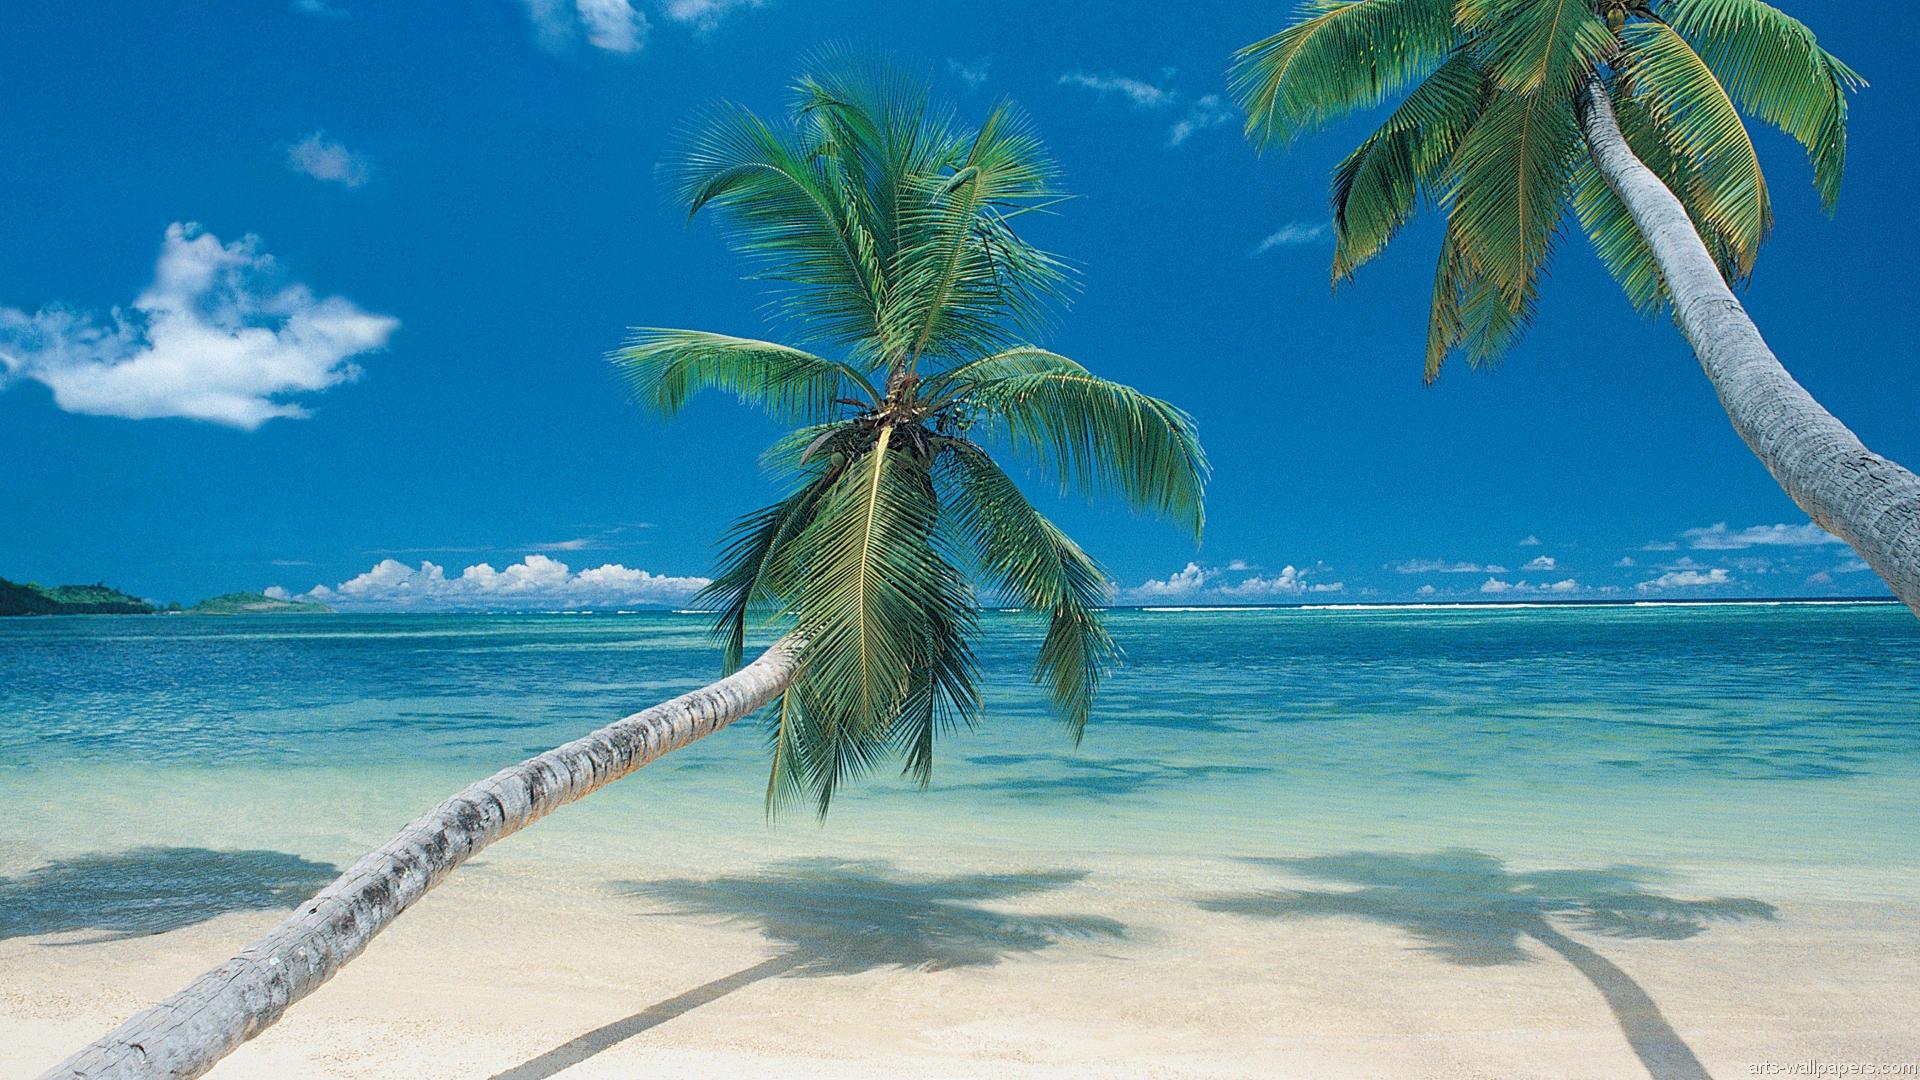 tropical island hd desktop wallpaper tropical island hd desktop